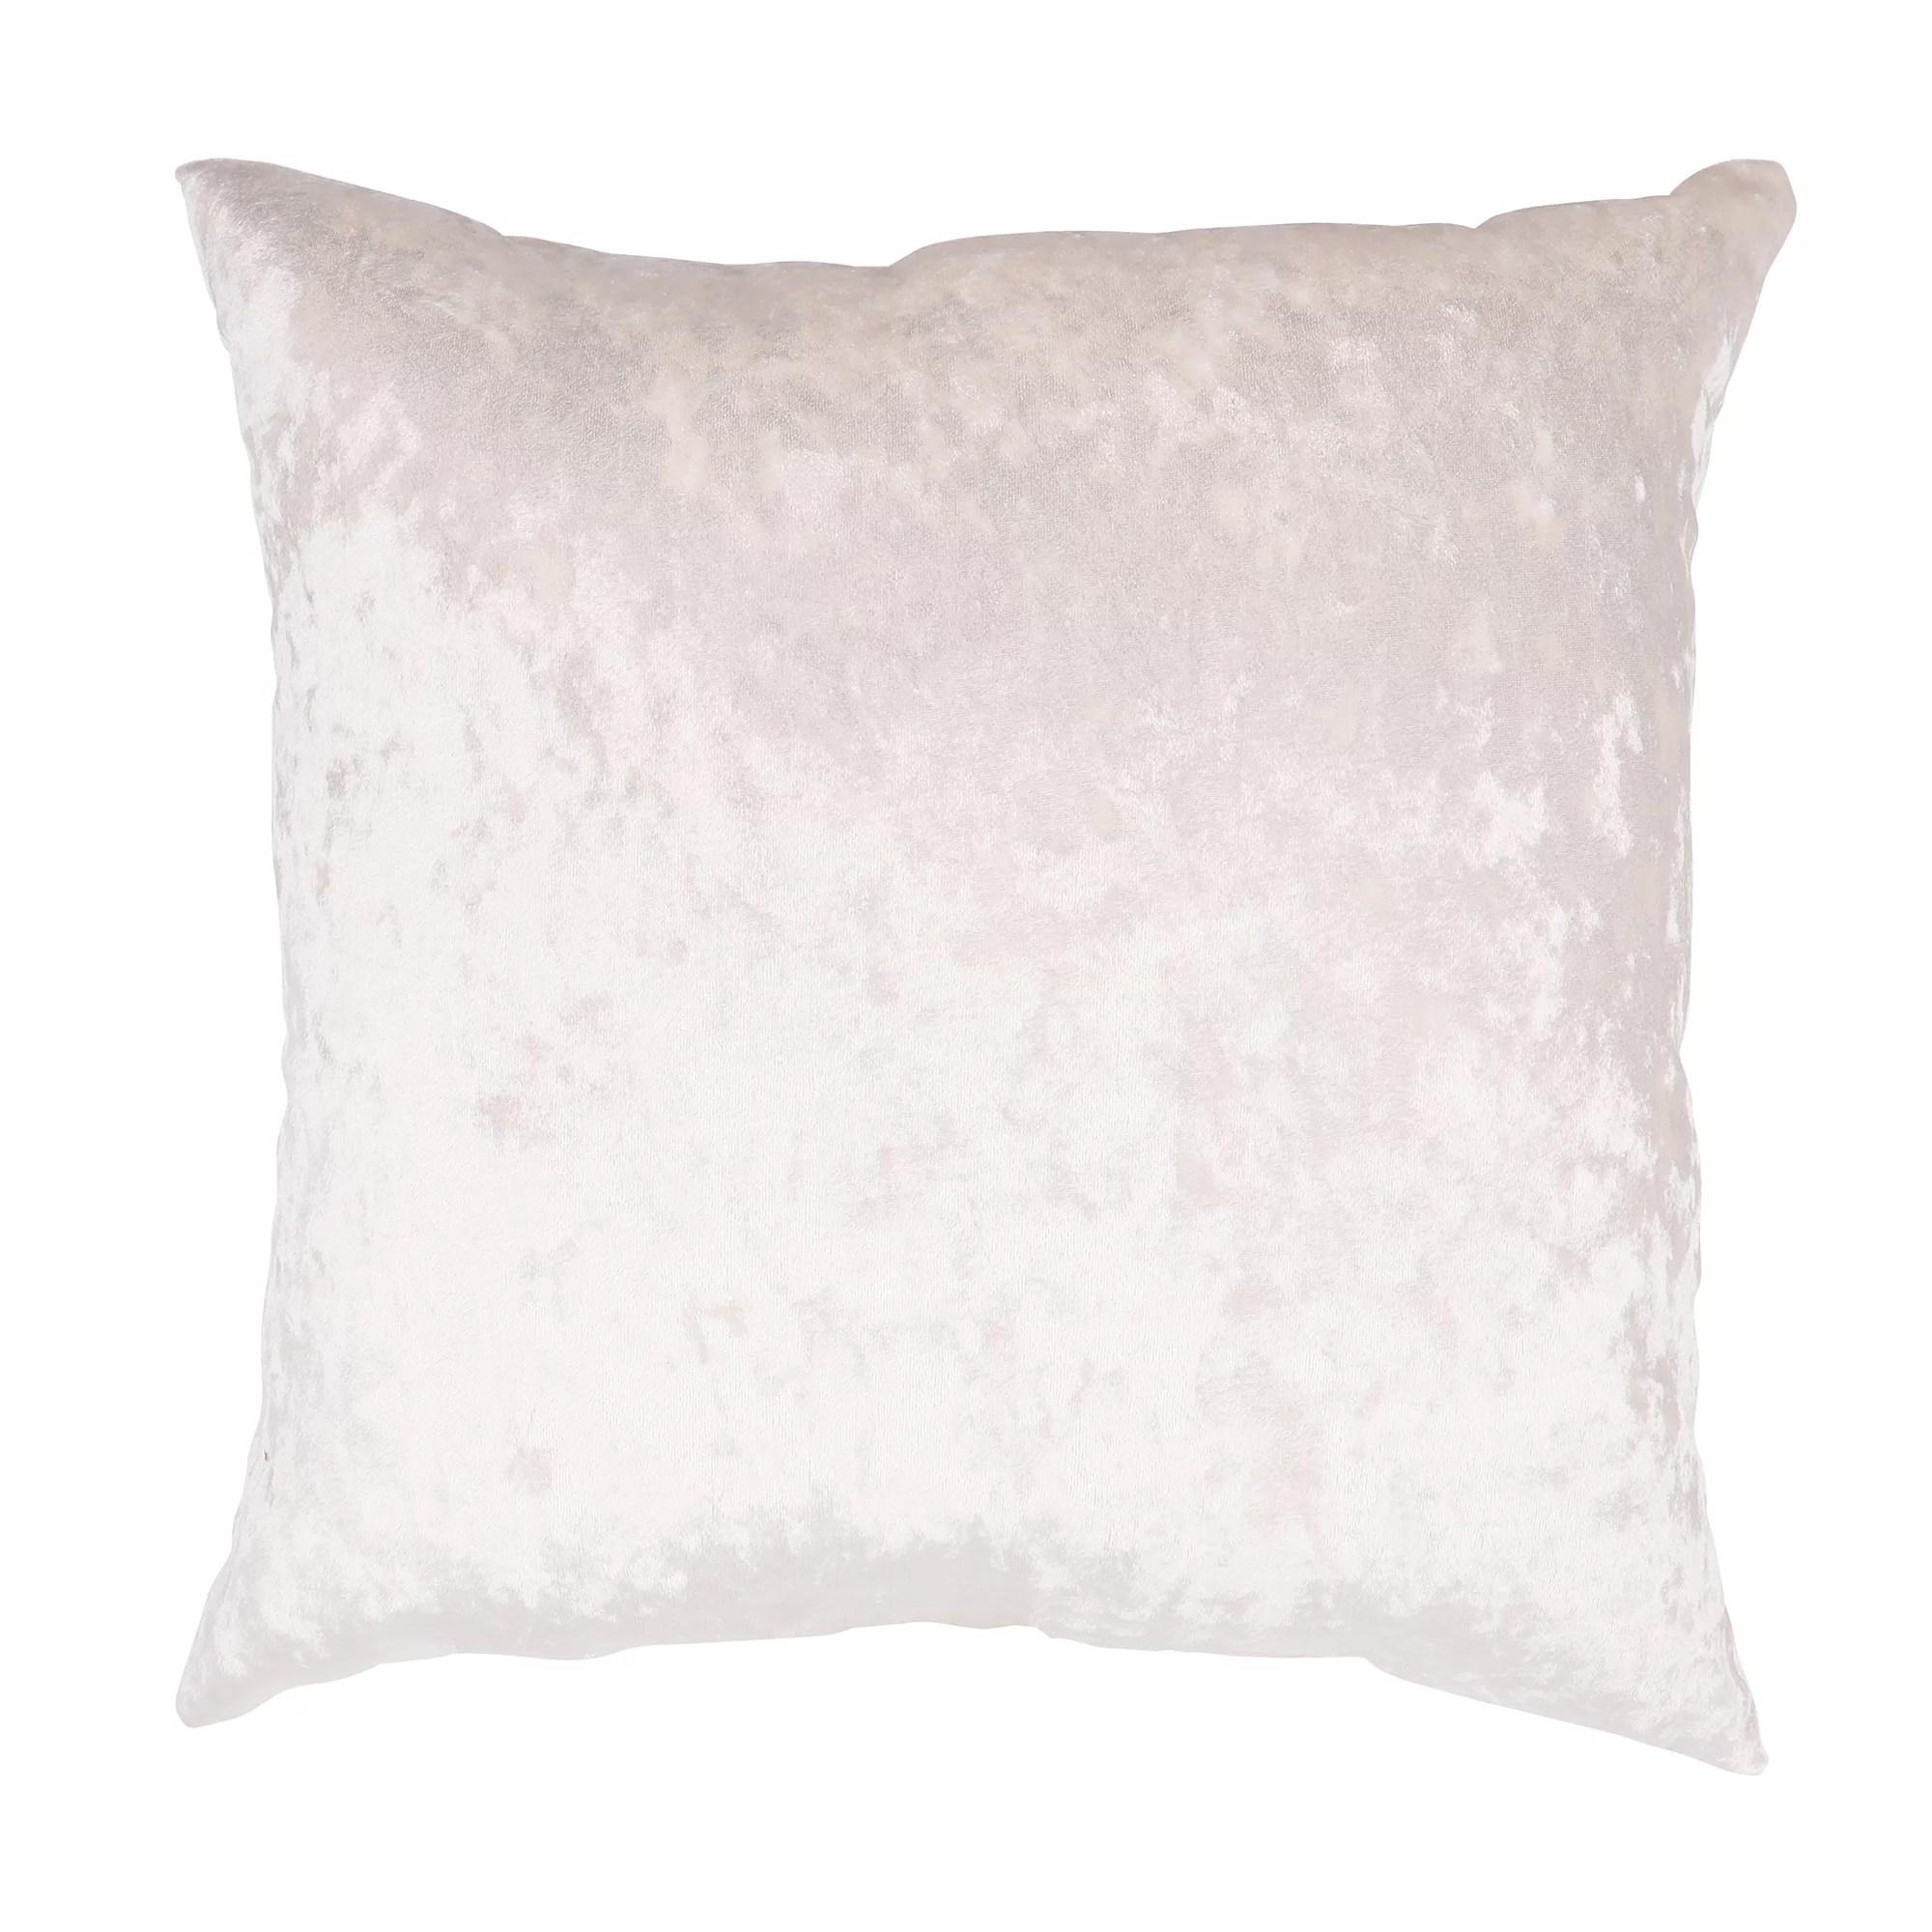 mainstays crushed velvet square decorative pillow 18 x 18 cream